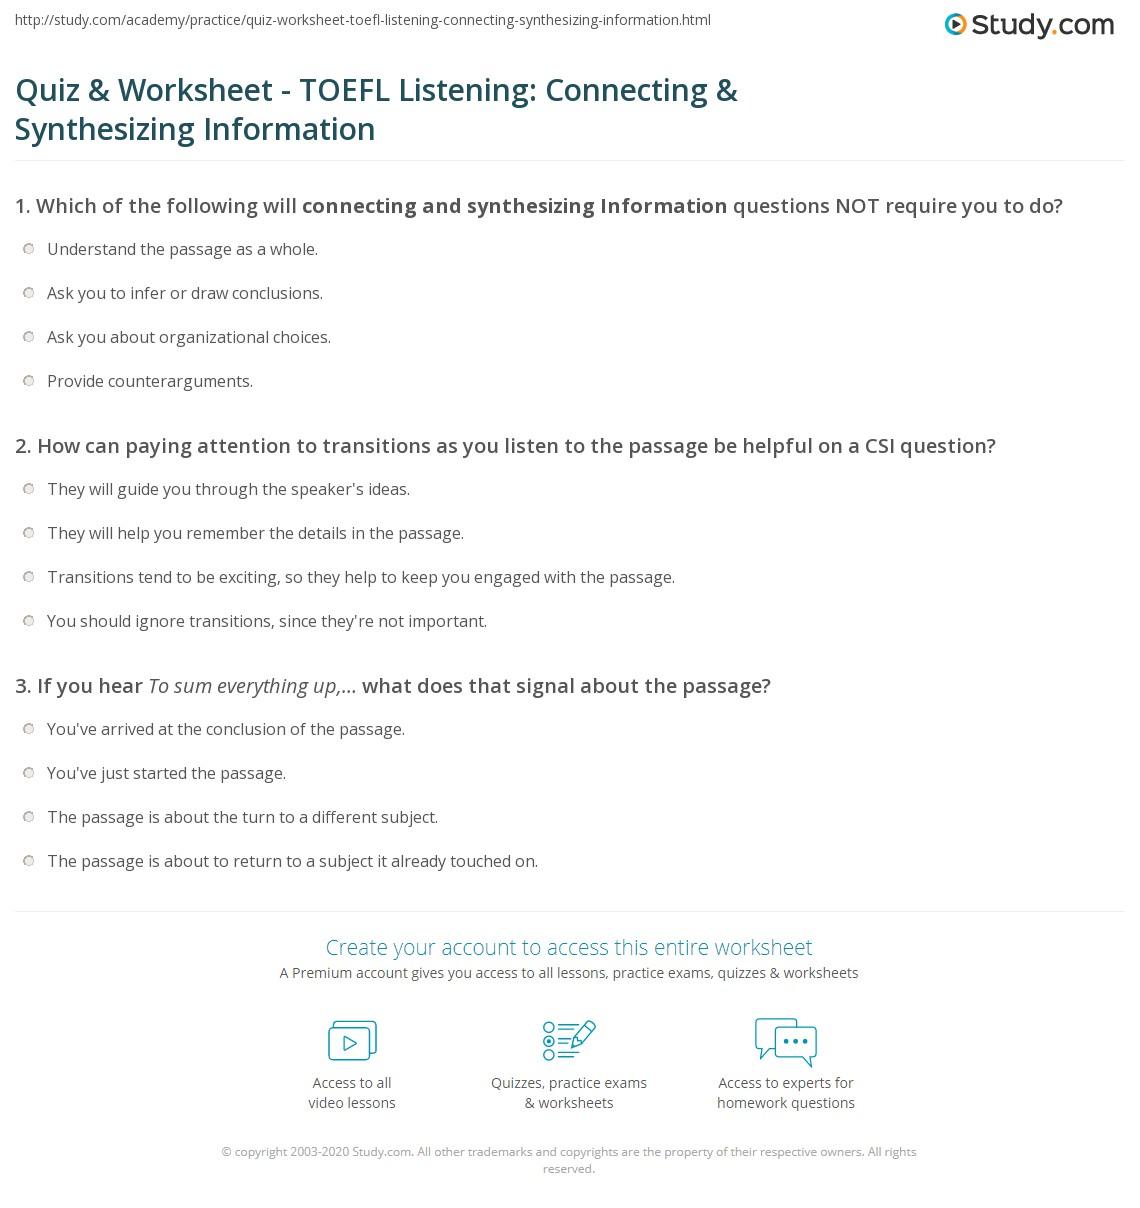 Quiz worksheet toefl listening connecting synthesizing print toefl listening practice connecting synthesizing information worksheet yadclub Choice Image